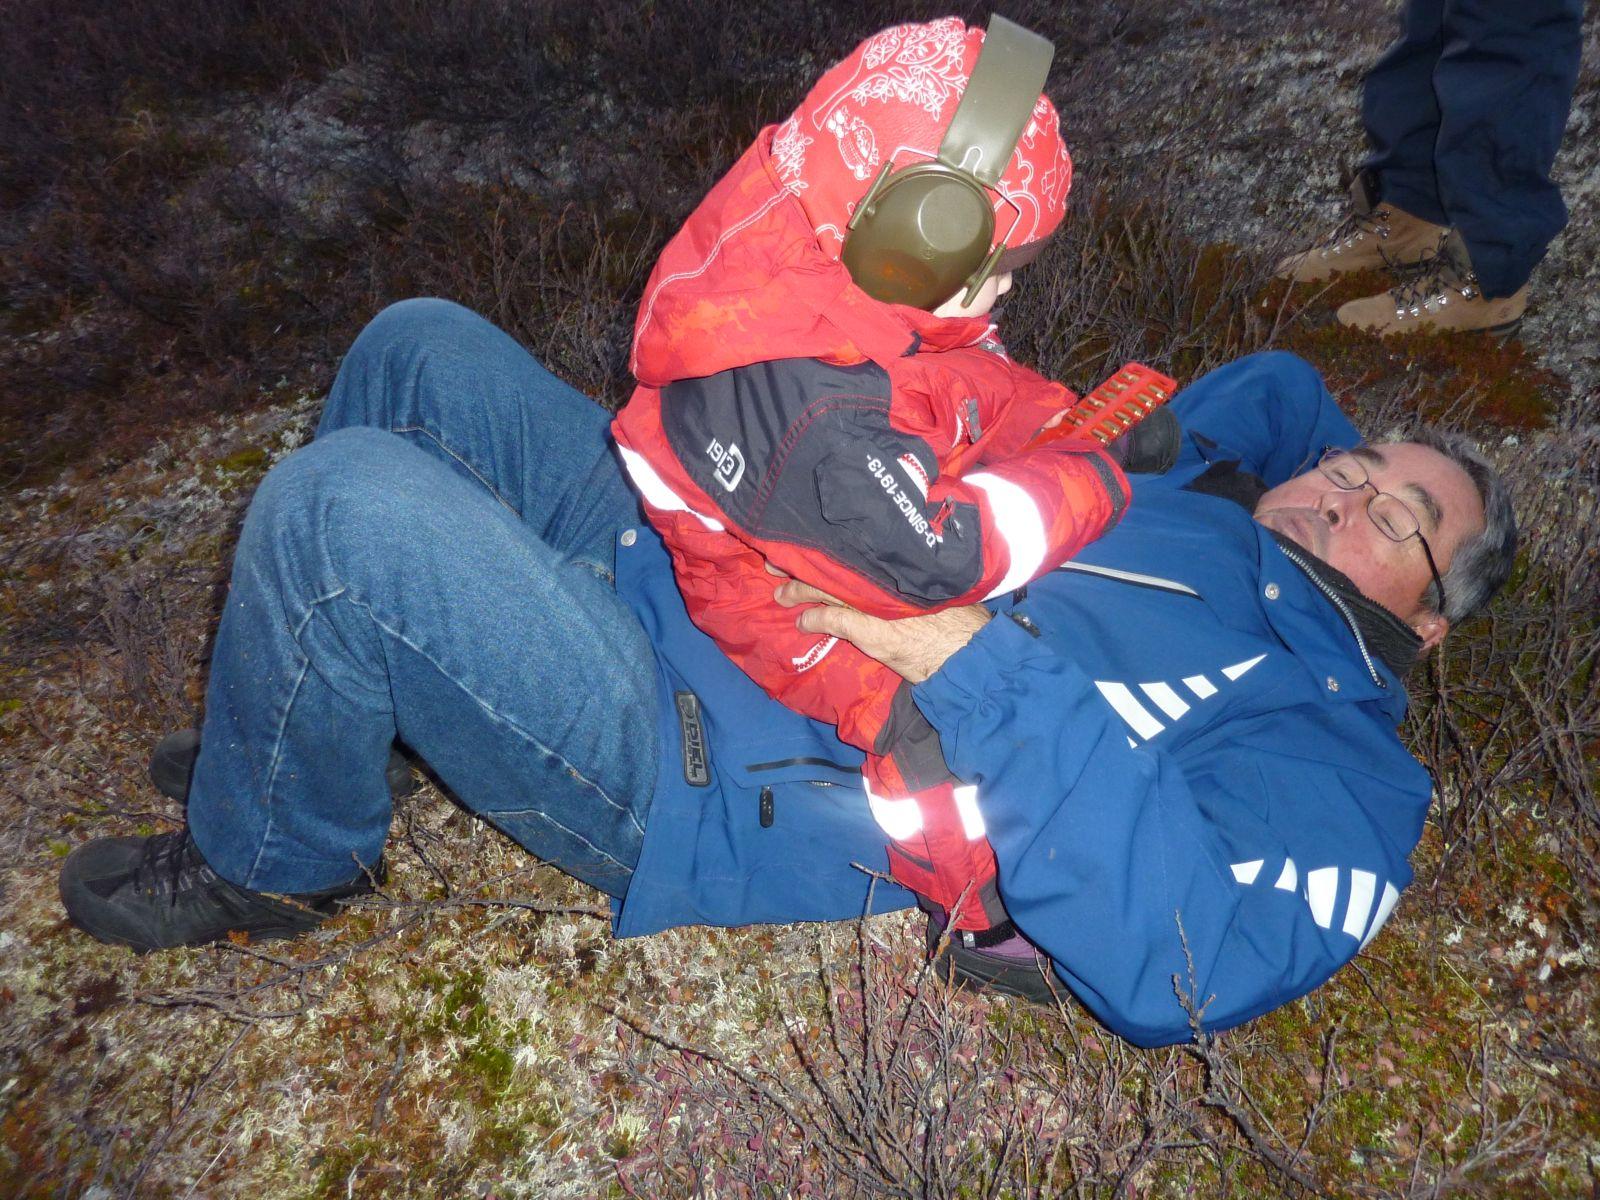 2010-10-14-1808_-_Jørgen Labansen; Qupanuk Eugenius Labansen